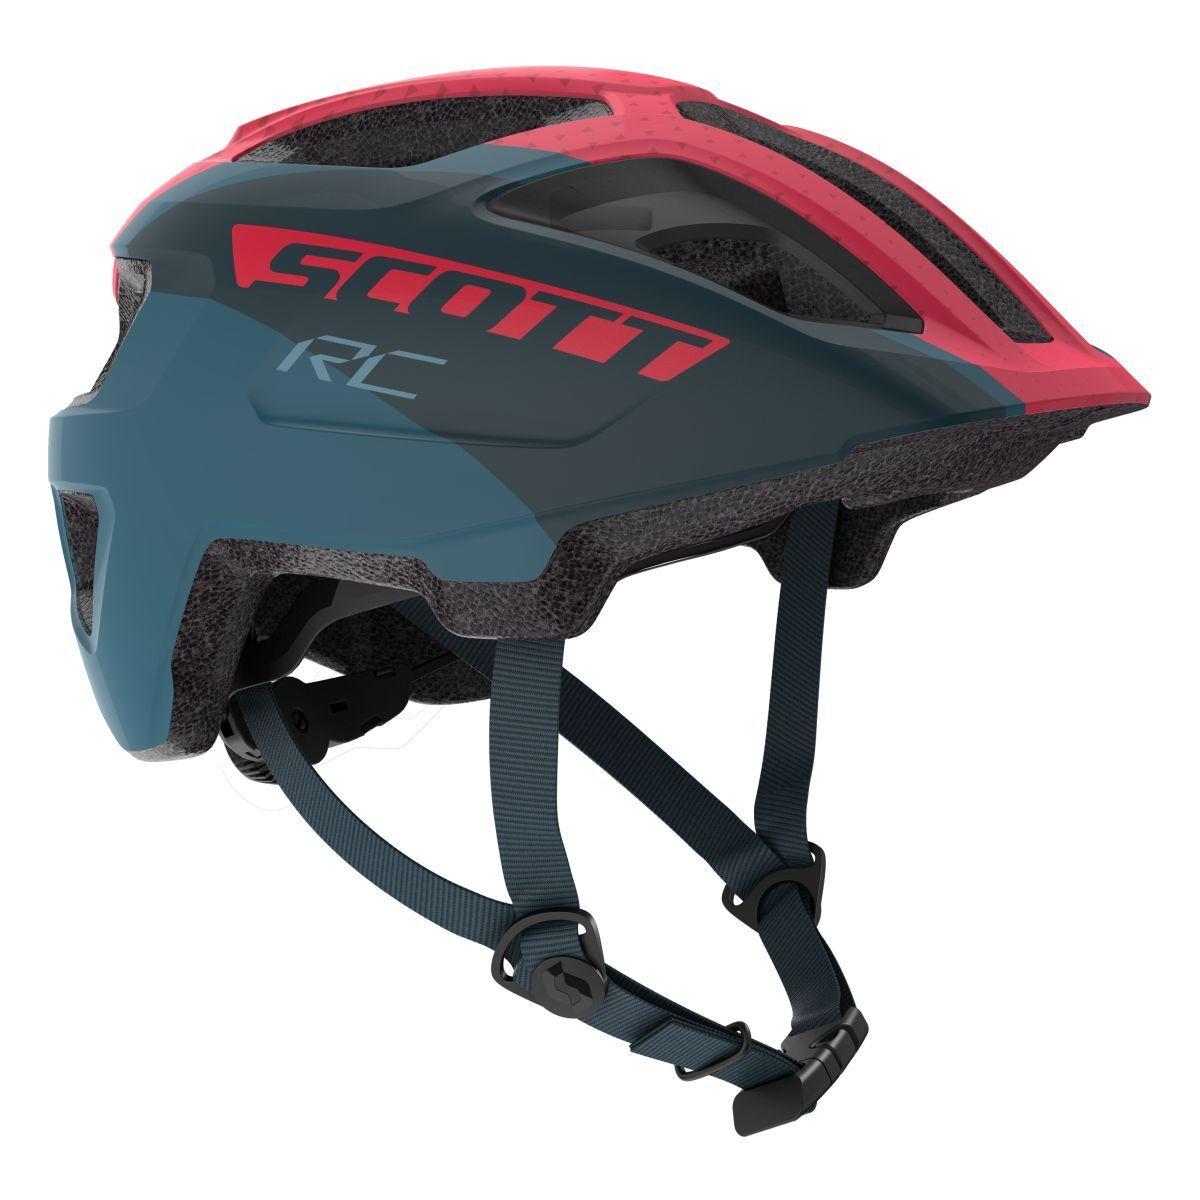 Scott spunto Jr Bicicletta Bambini Bambini Bambini Casco Tg. 50-56cm Blu rosa 2019   Ottima qualità  3b9078